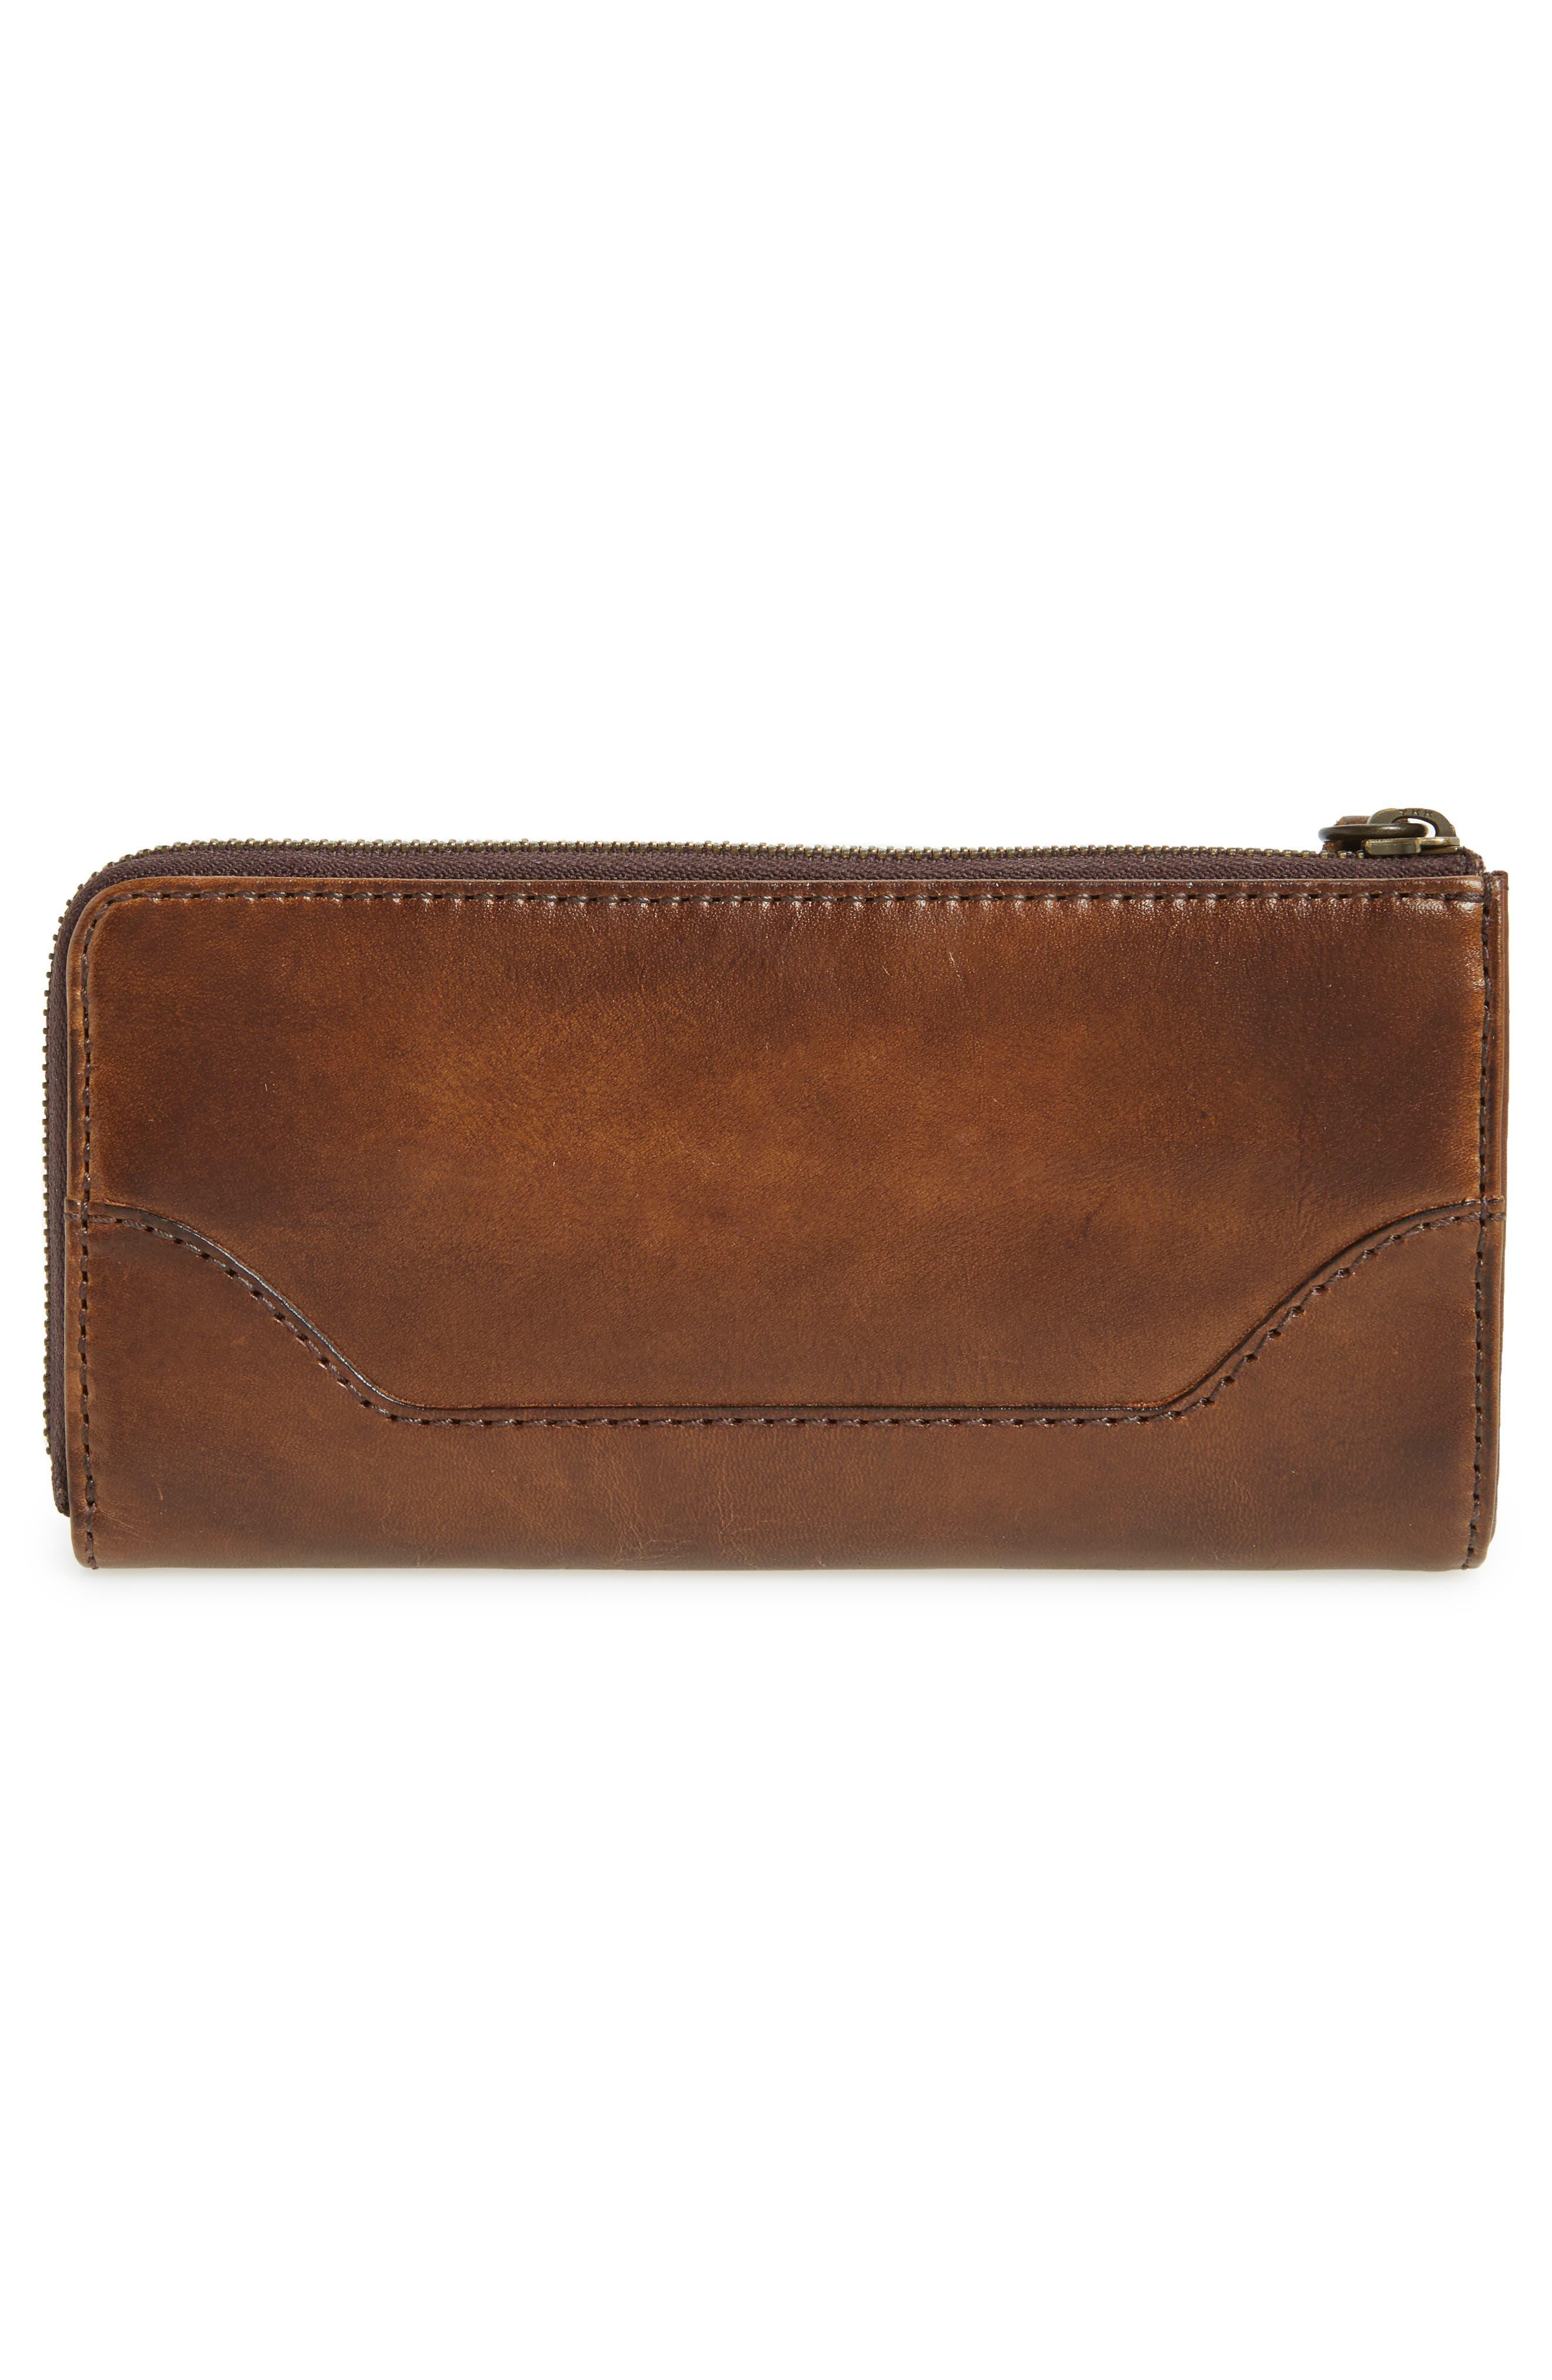 Melissa Leather Wallet,                             Alternate thumbnail 4, color,                             Dark Brown